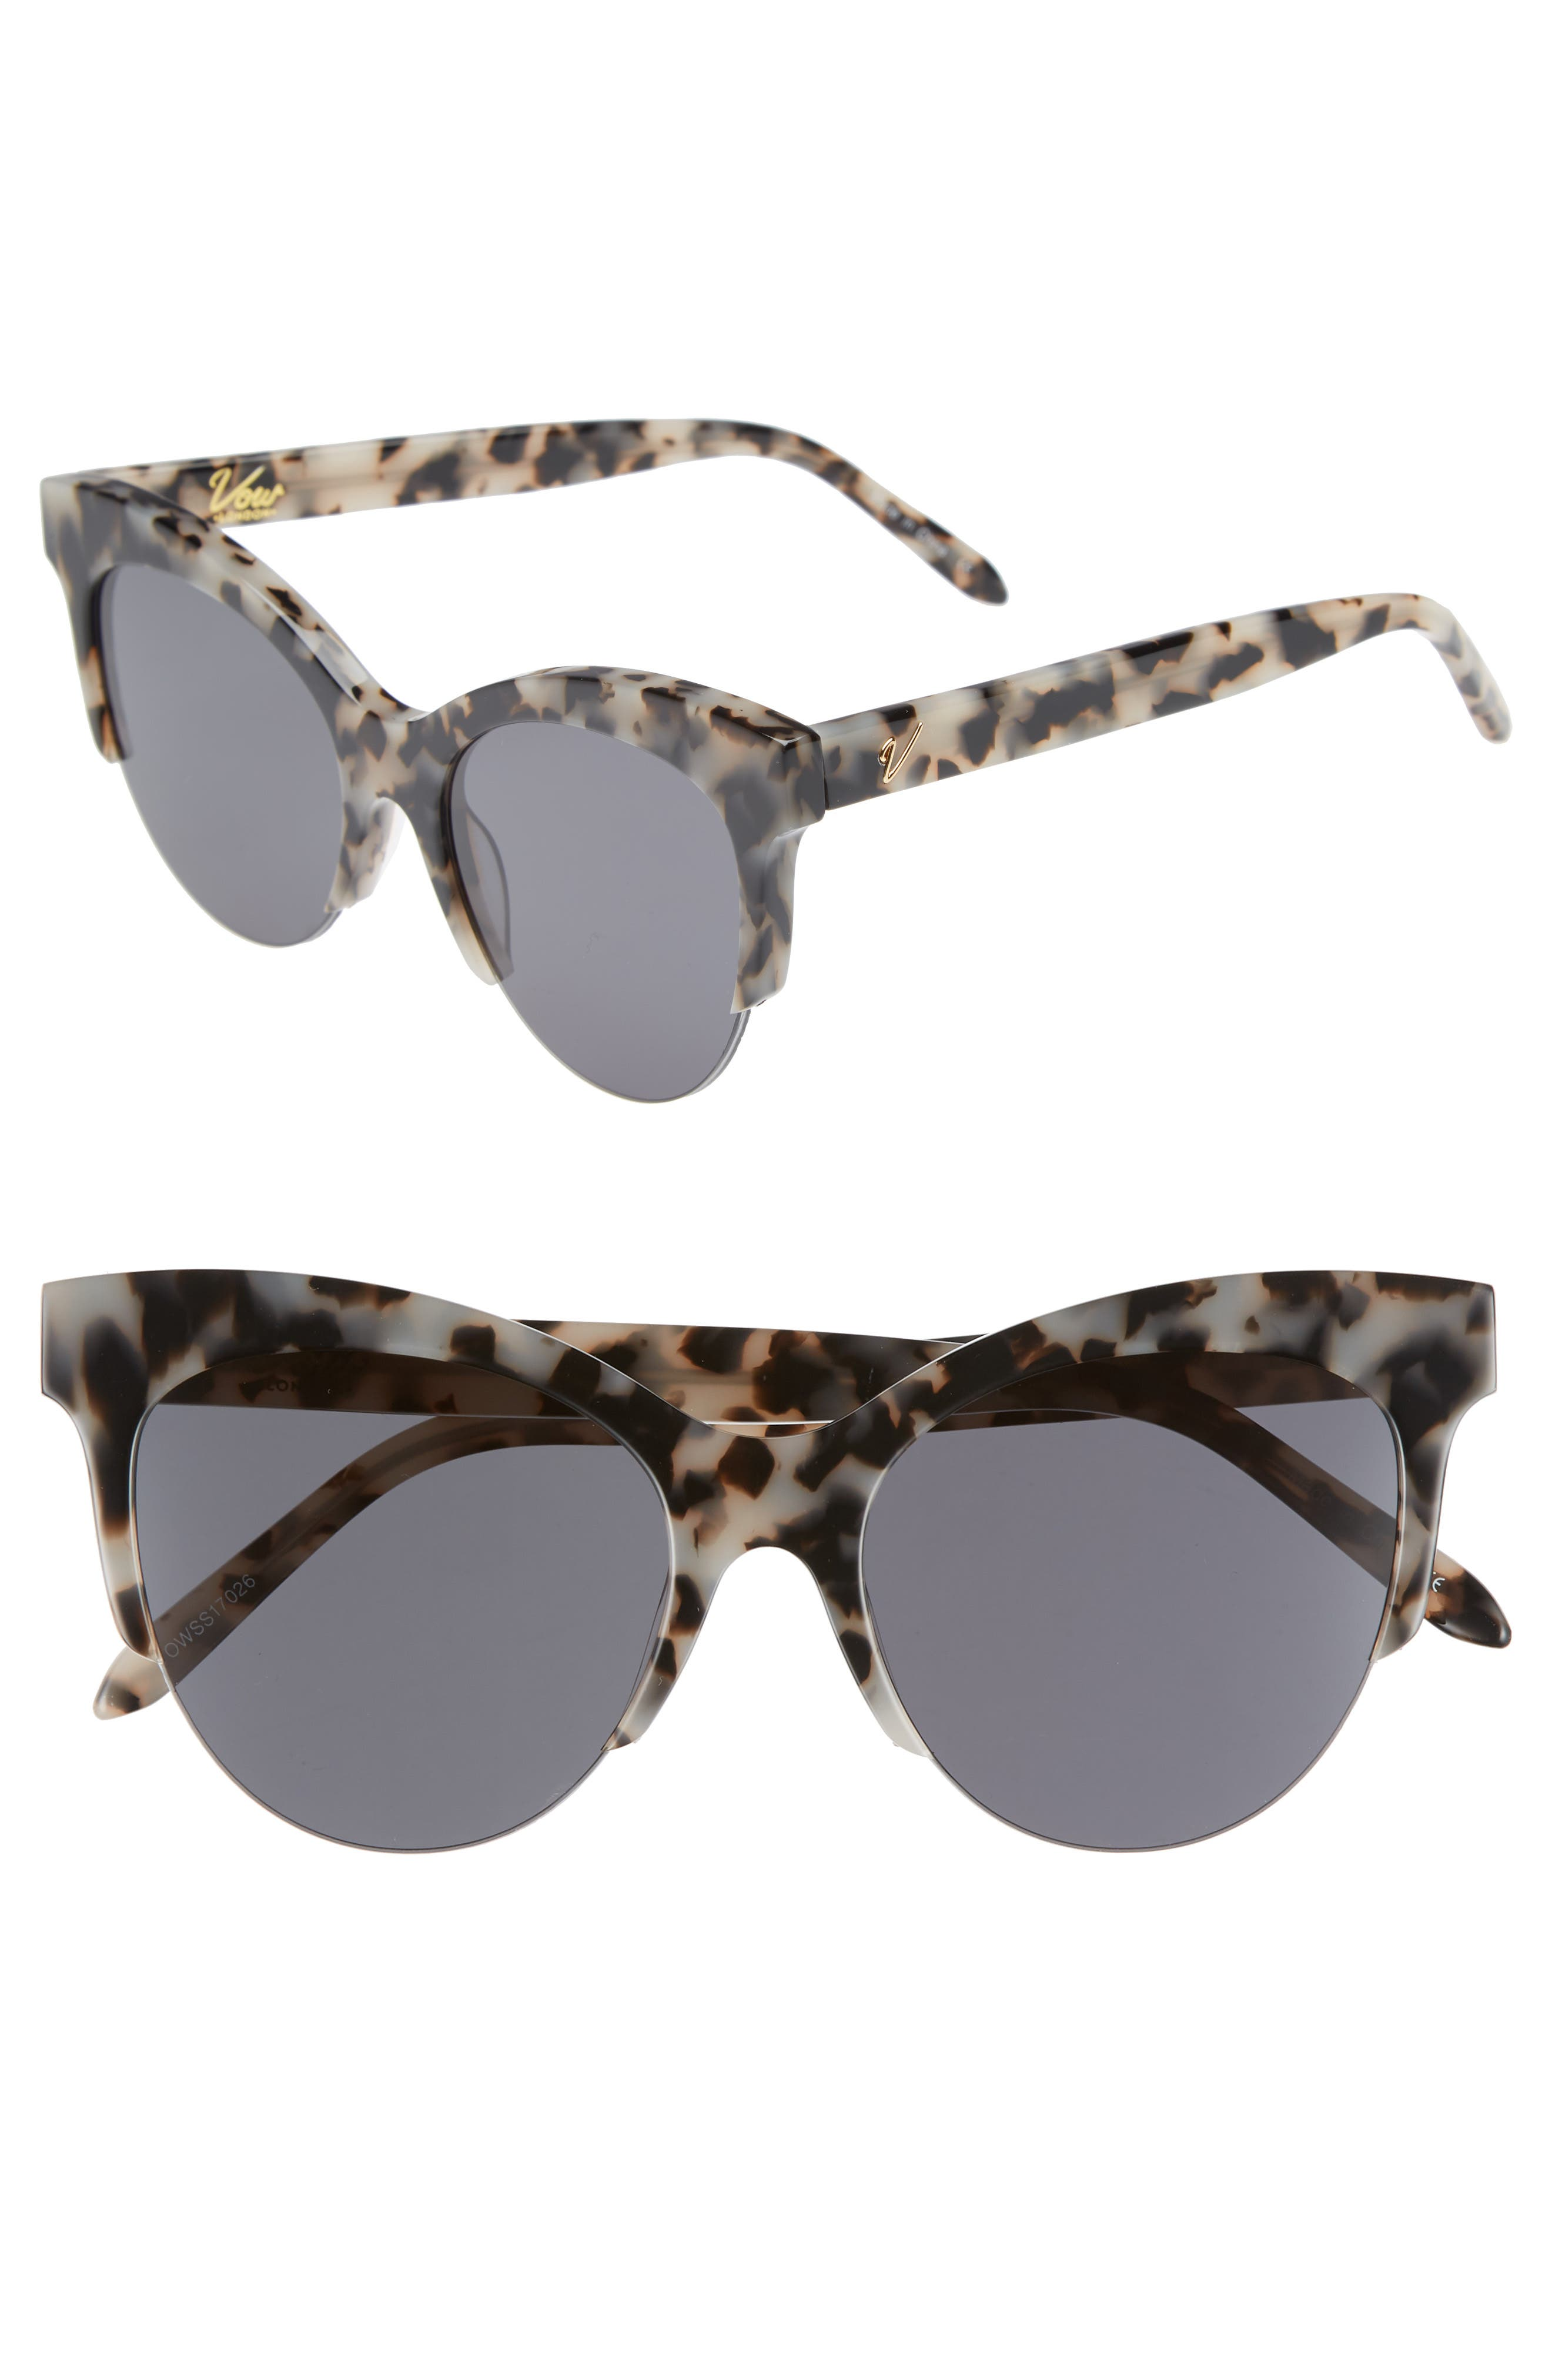 Vow London Cody 5m Cat Eye Sunglasses - Milky Tortoise/ Smoke